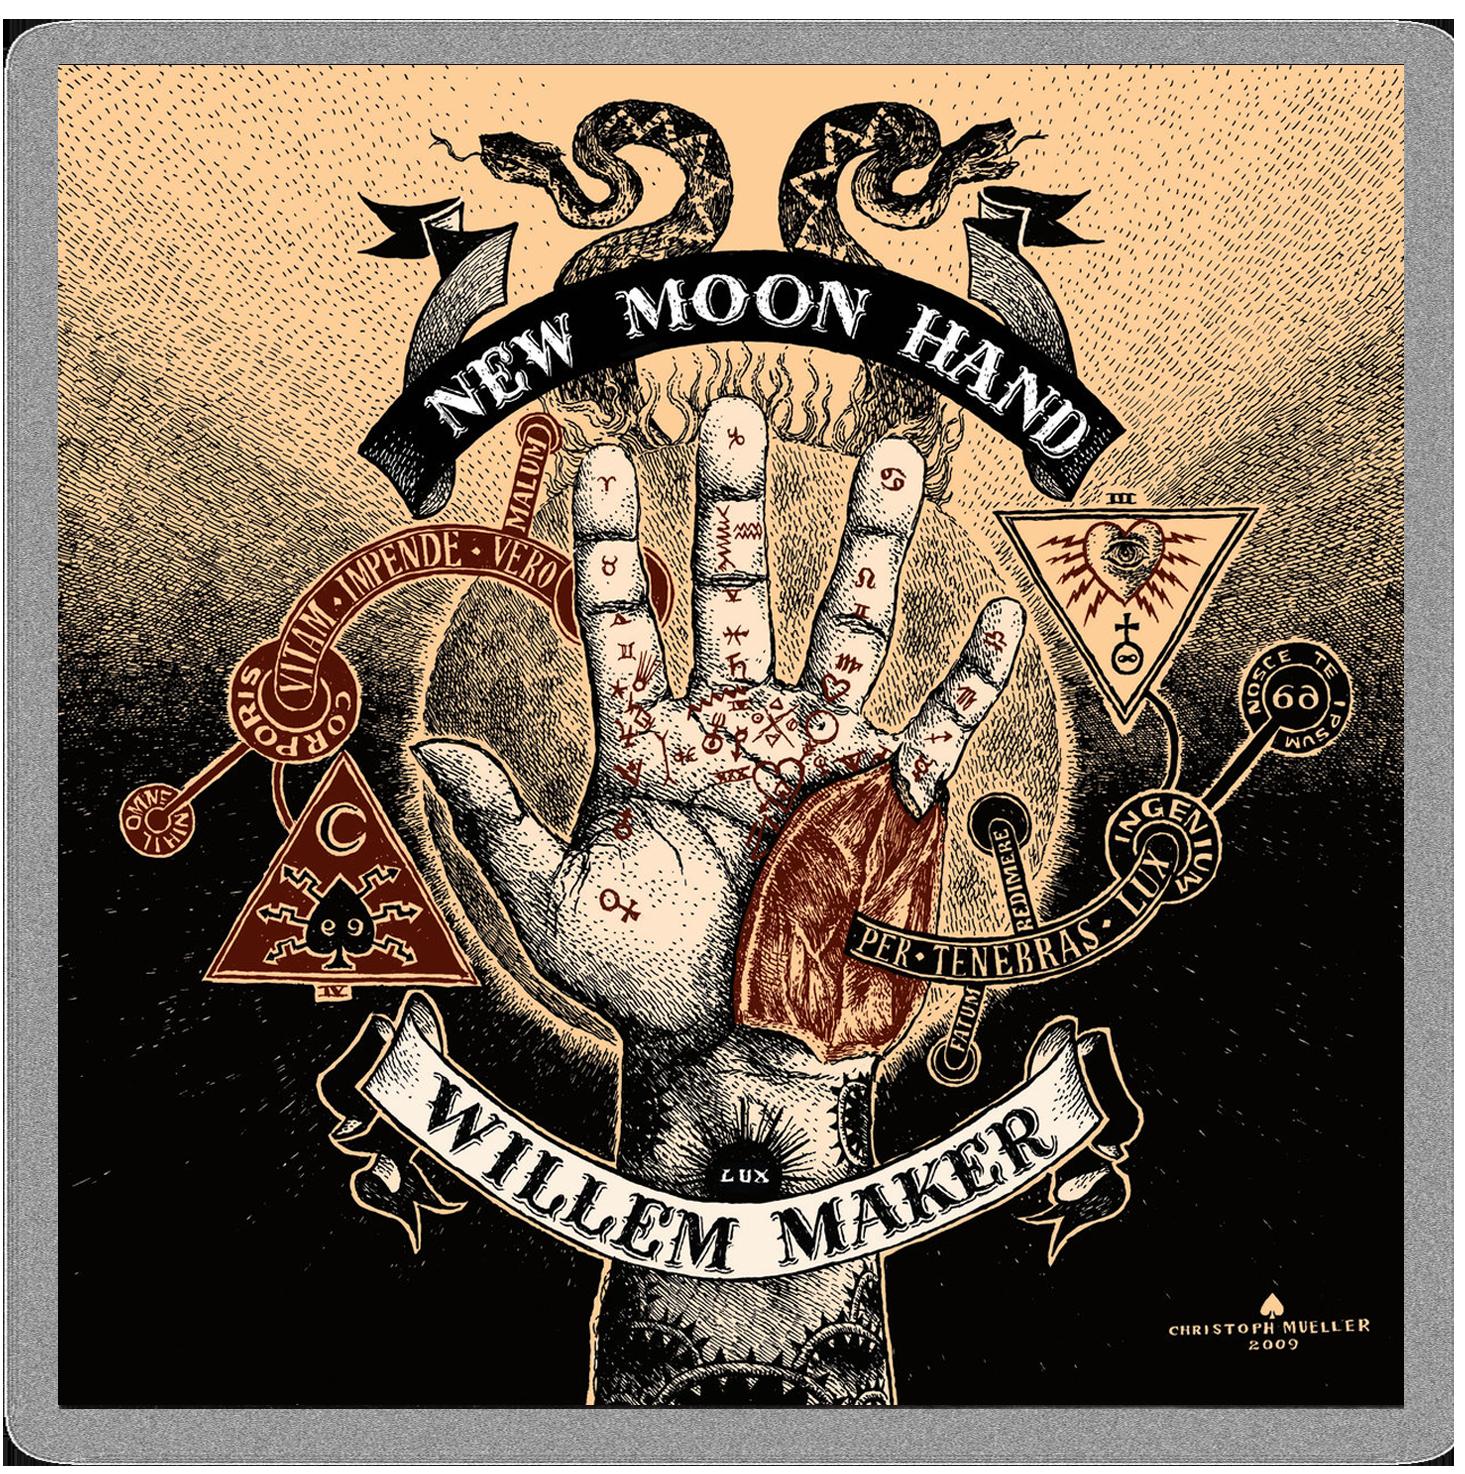 Willem Maker – New Moon Hand artwork by Christoph Mueller